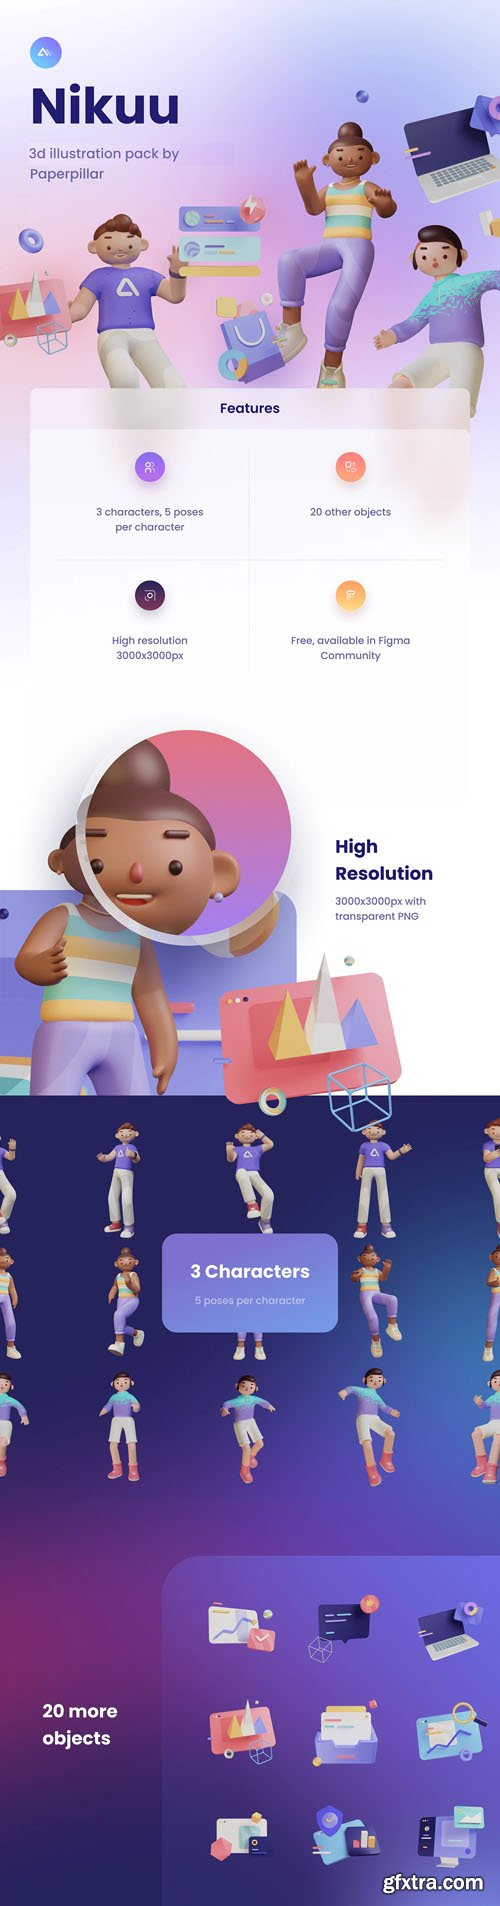 Nikuu - 3D Illustration Pack for Figma